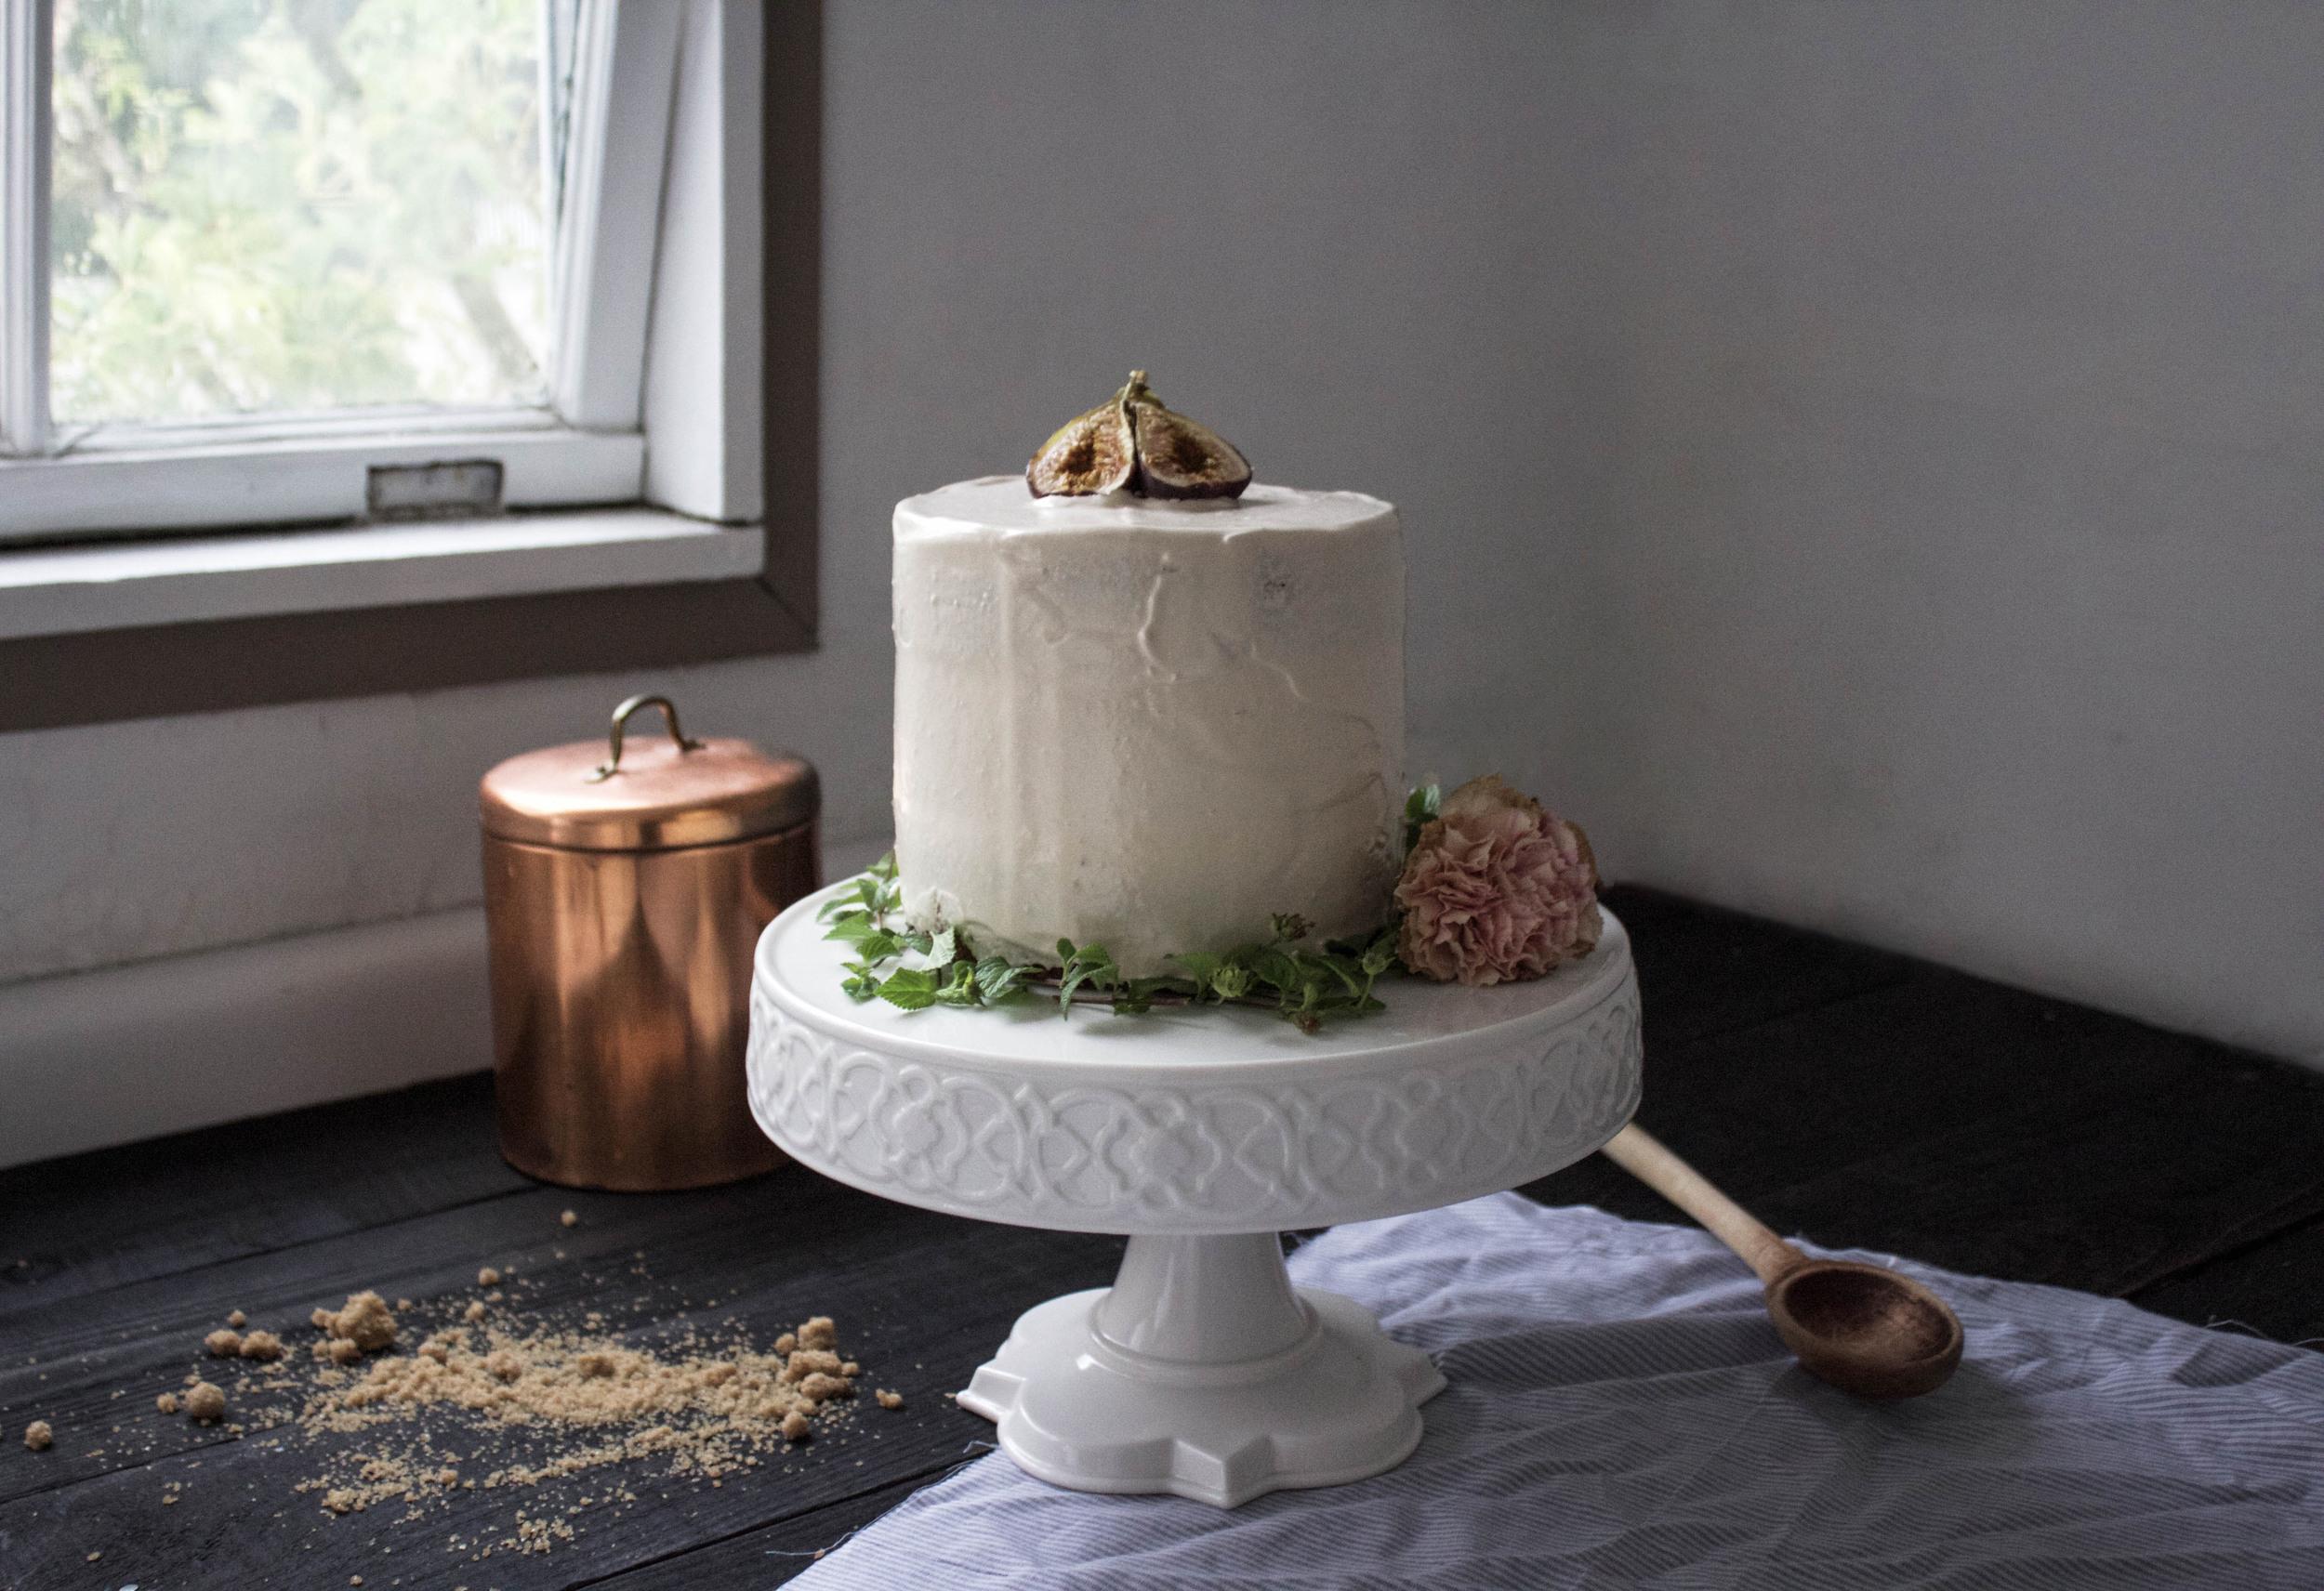 Fig, Oat, and Caramel Buttercream Cake